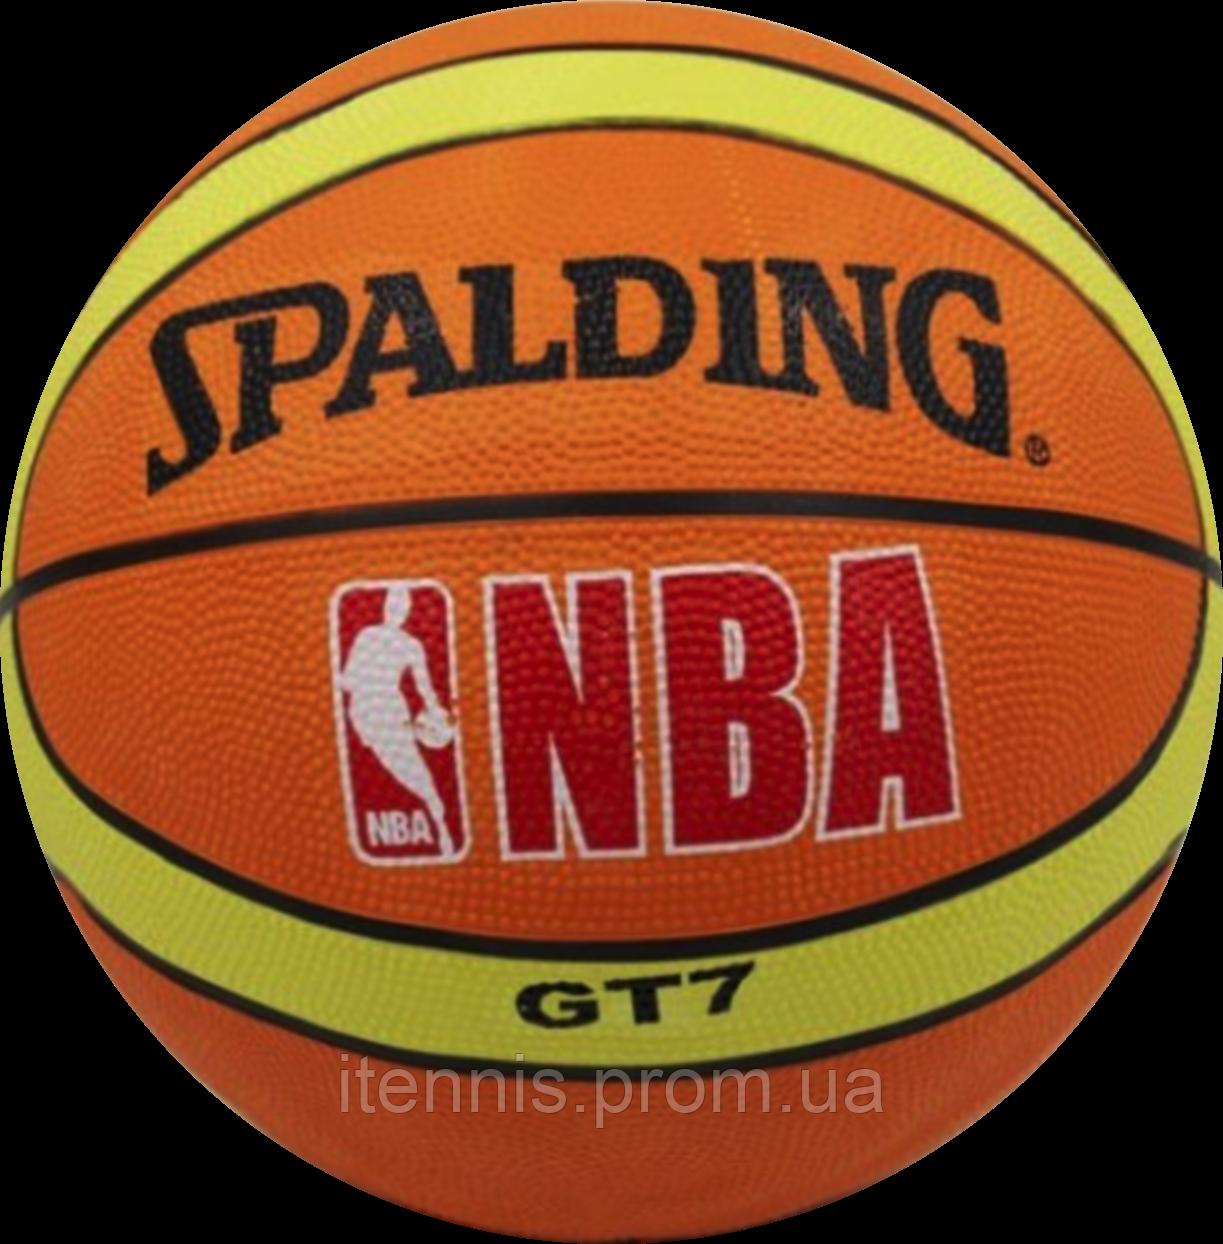 Баскетбольный мяч Spalding NBA GT7